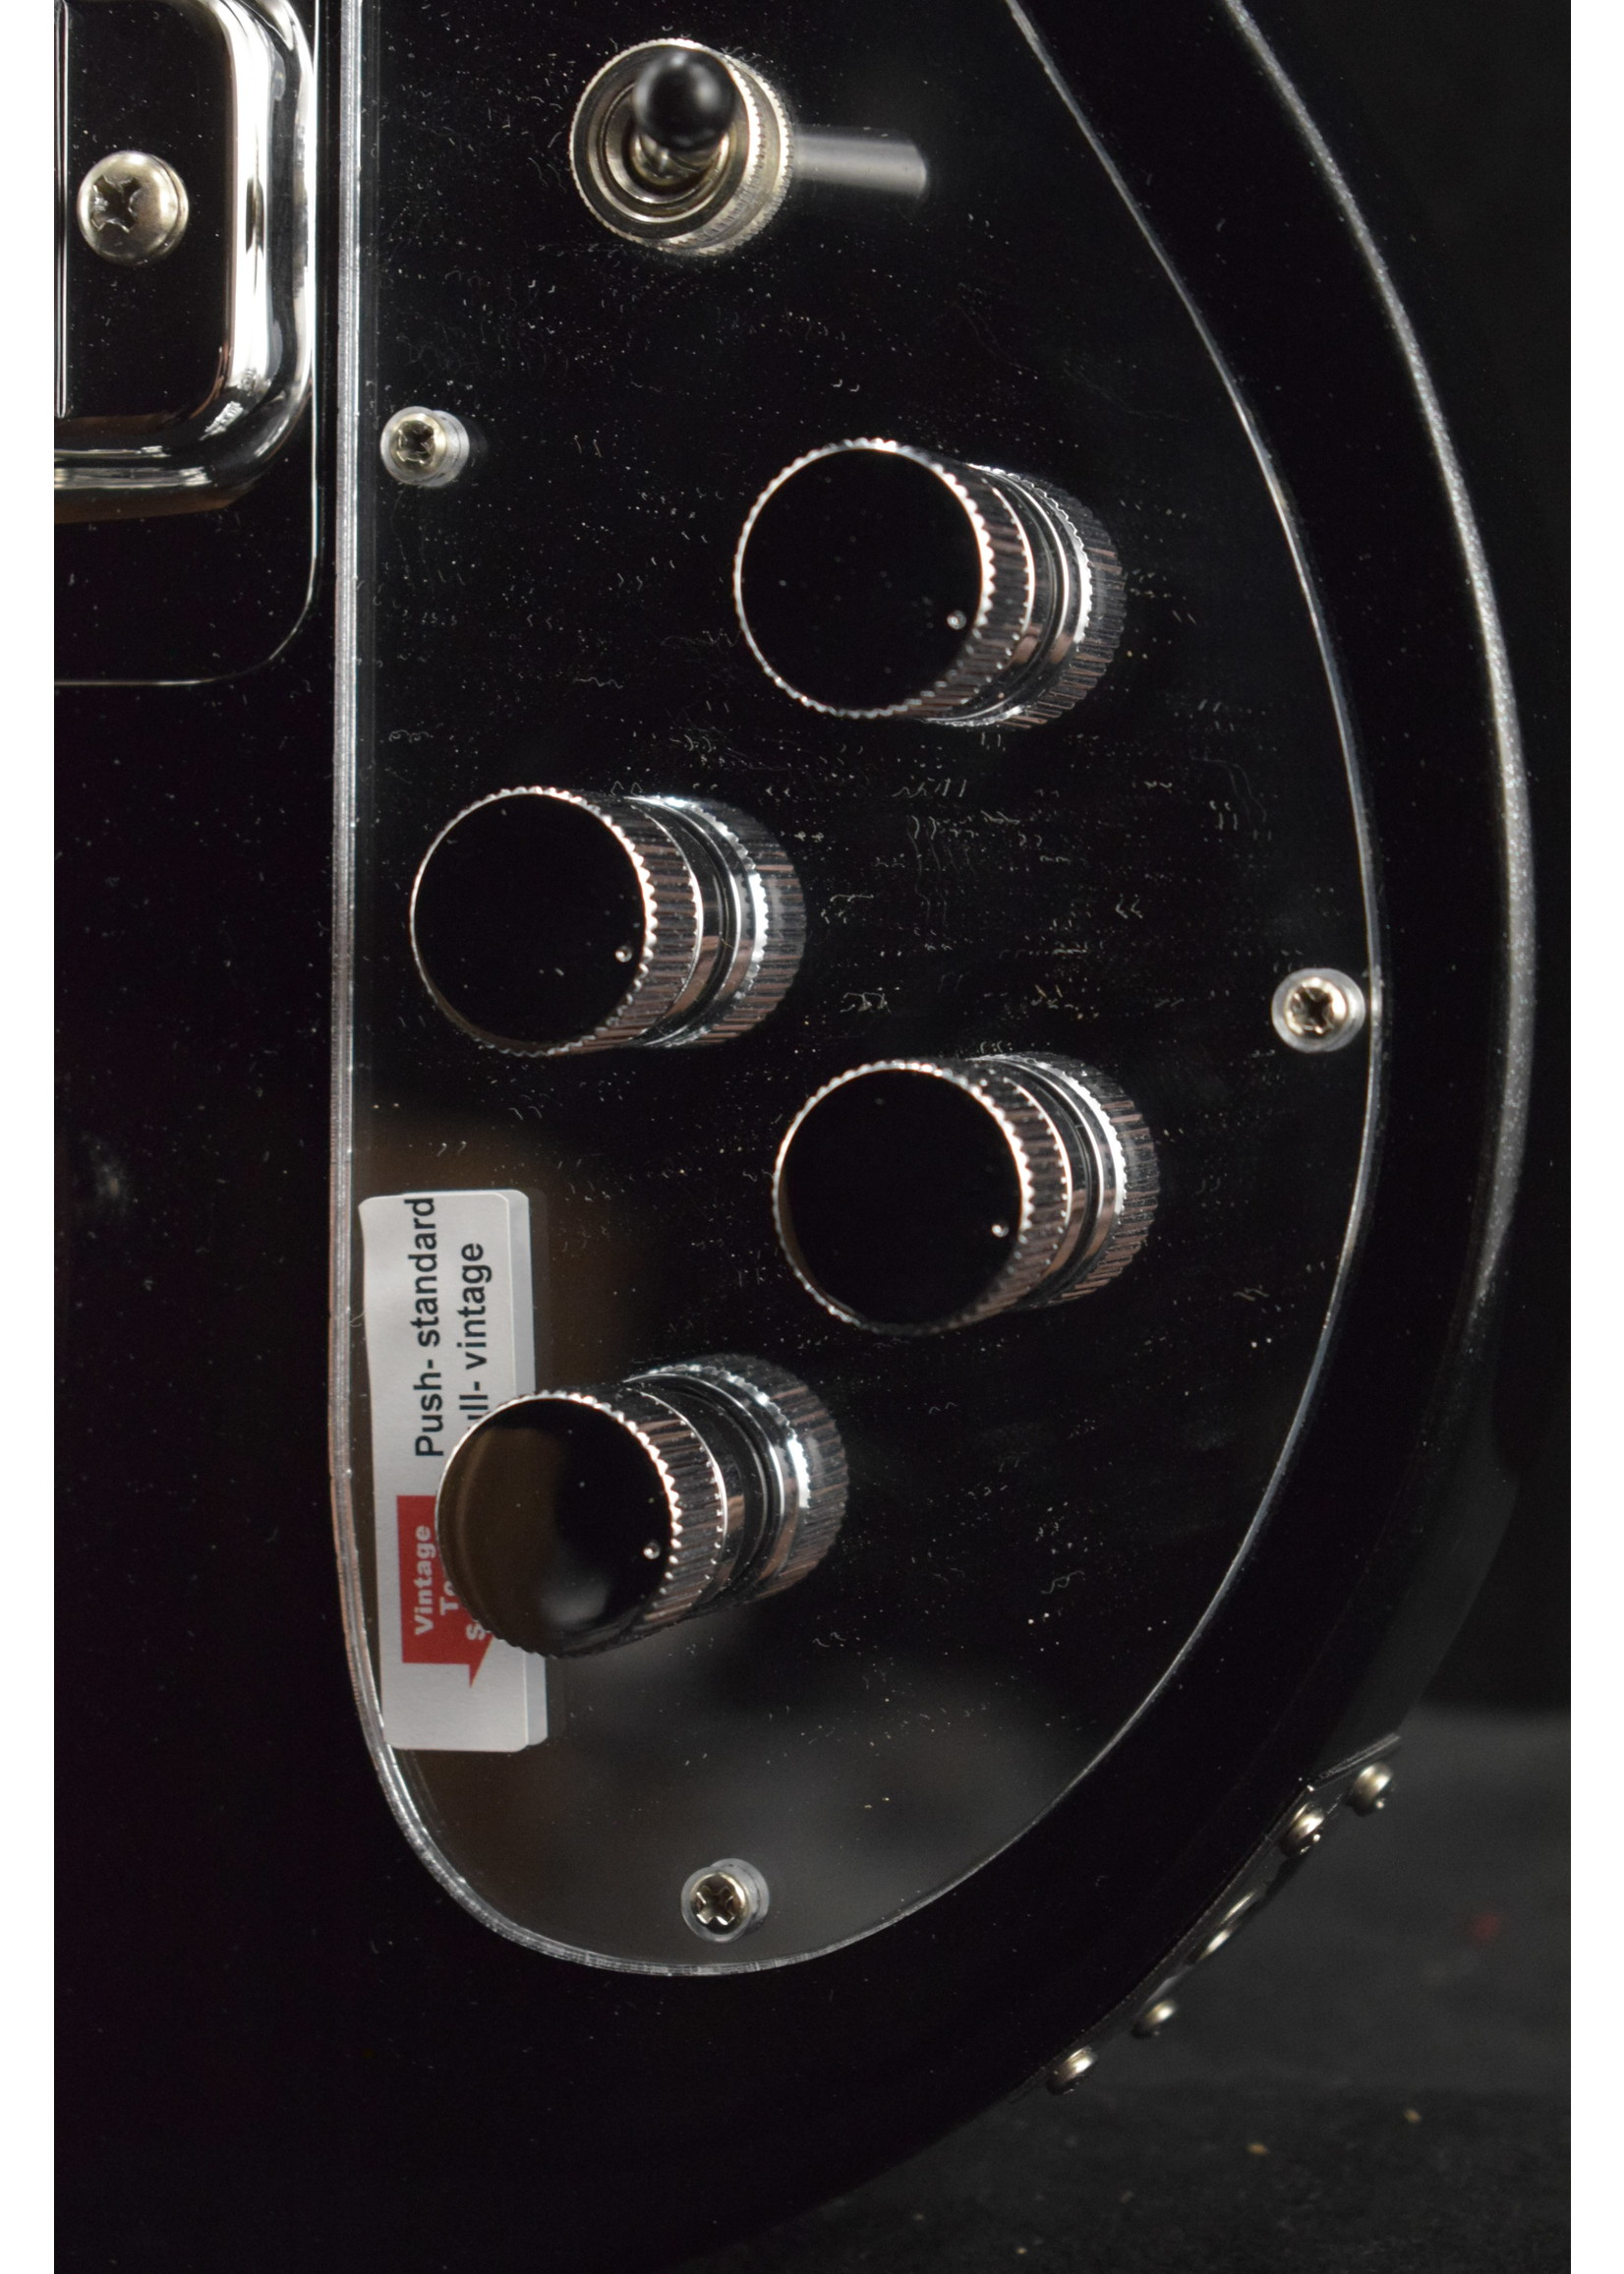 Rickenbacker Rickenbacker 4003S Maple Fretboard Jetglo Pearlstar with Molded Black Hardshell Case